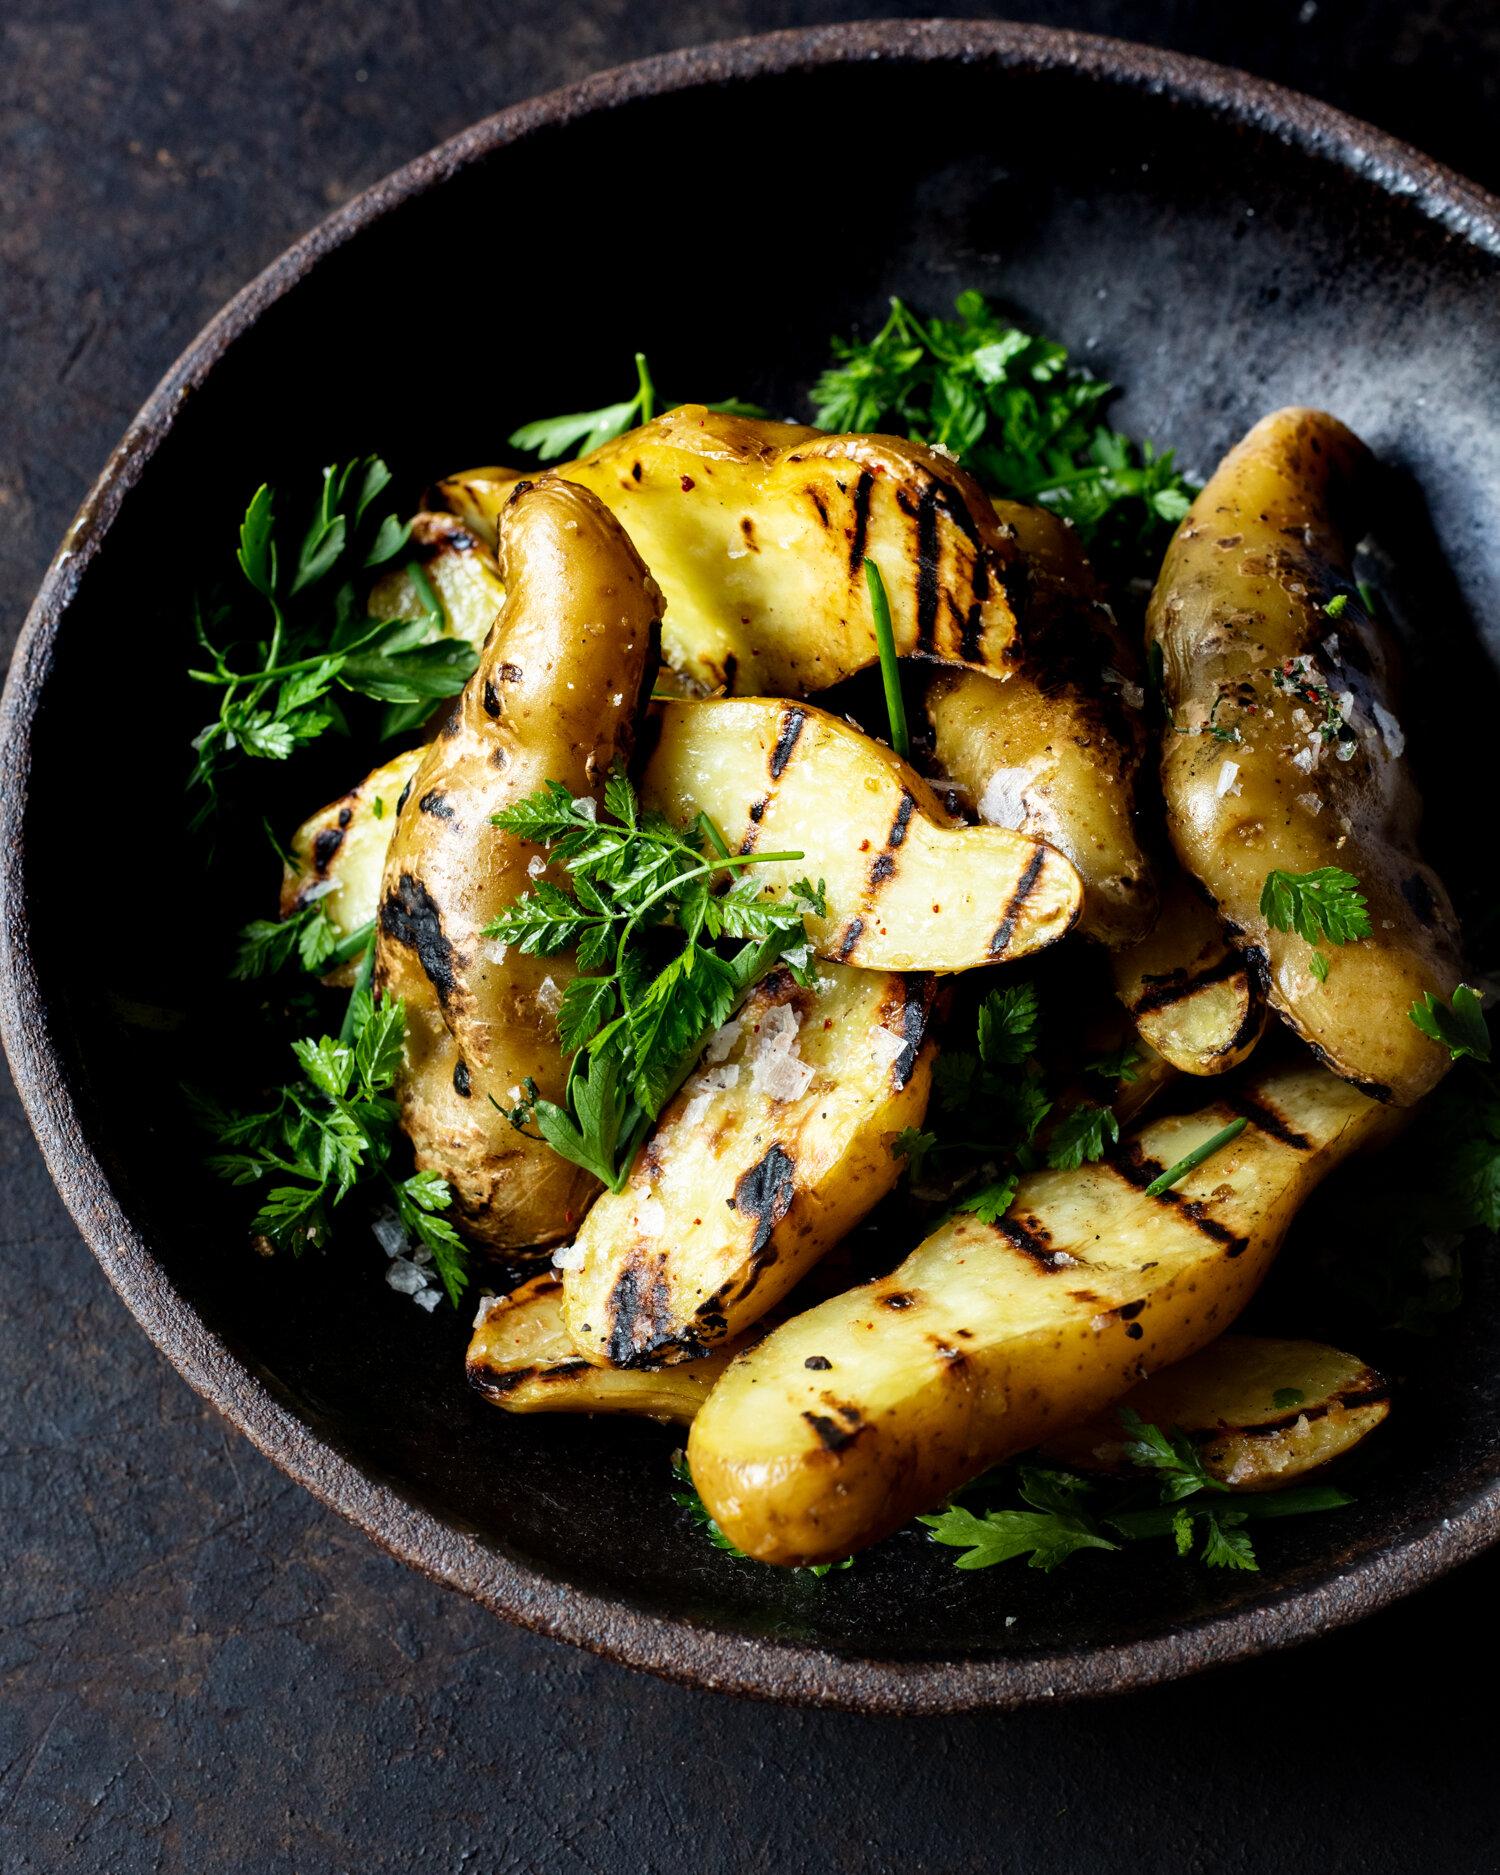 erin-scott_san-francisco-california-food-photographer-natural-light-editorial-grilled-potatoes-dark-georgedolese_may2019-1838.jpg